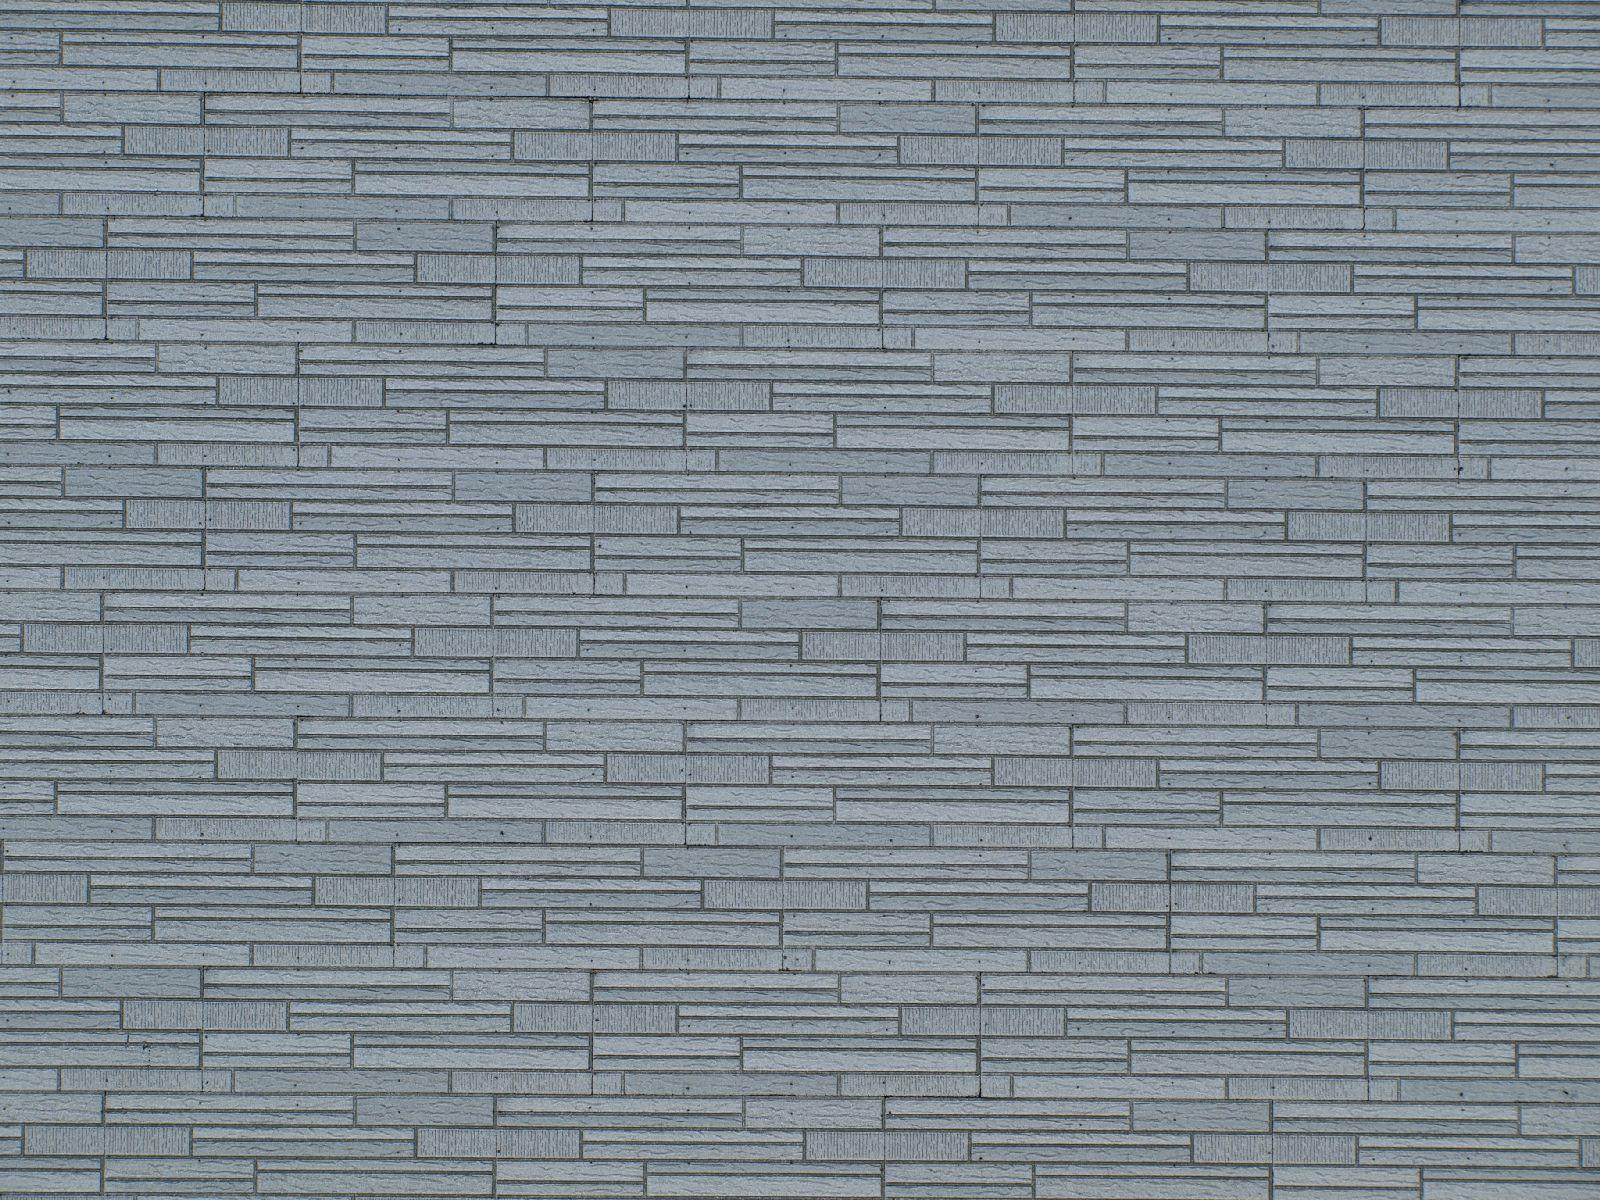 Wand-Mauerwerk-Backstein_Textur_A_P6013225